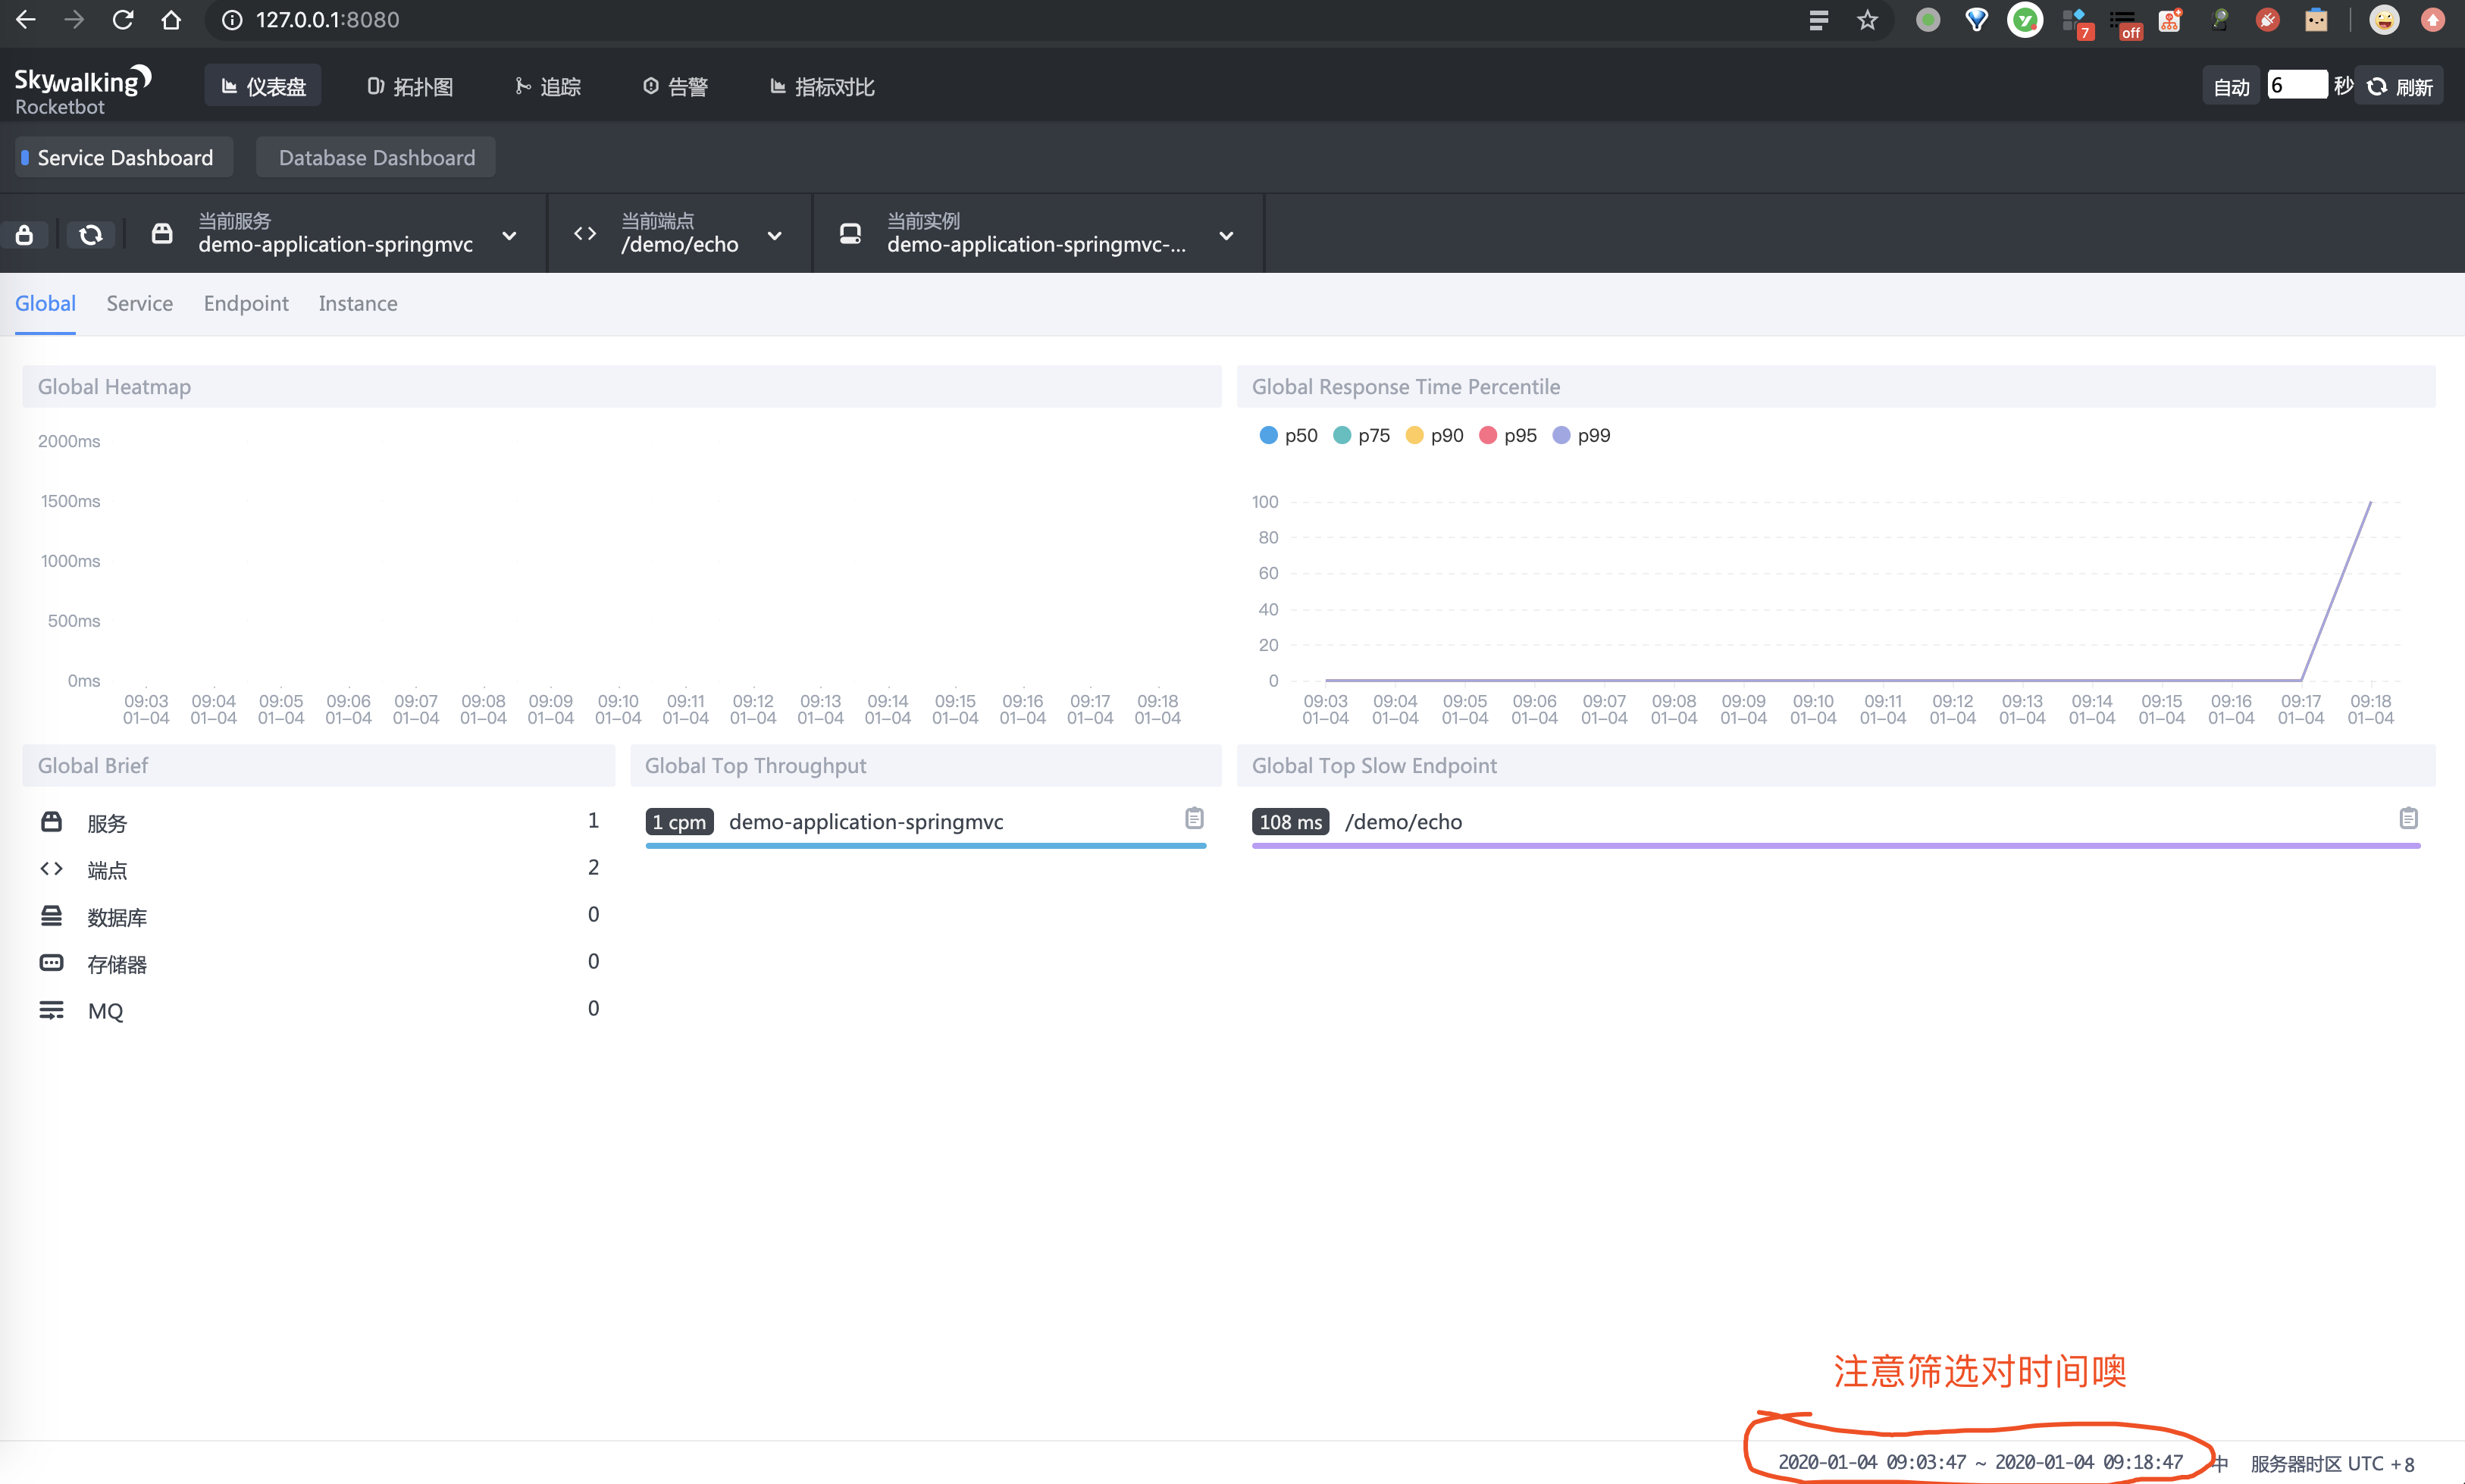 SkyWalking UI 界面 —— 仪表盘